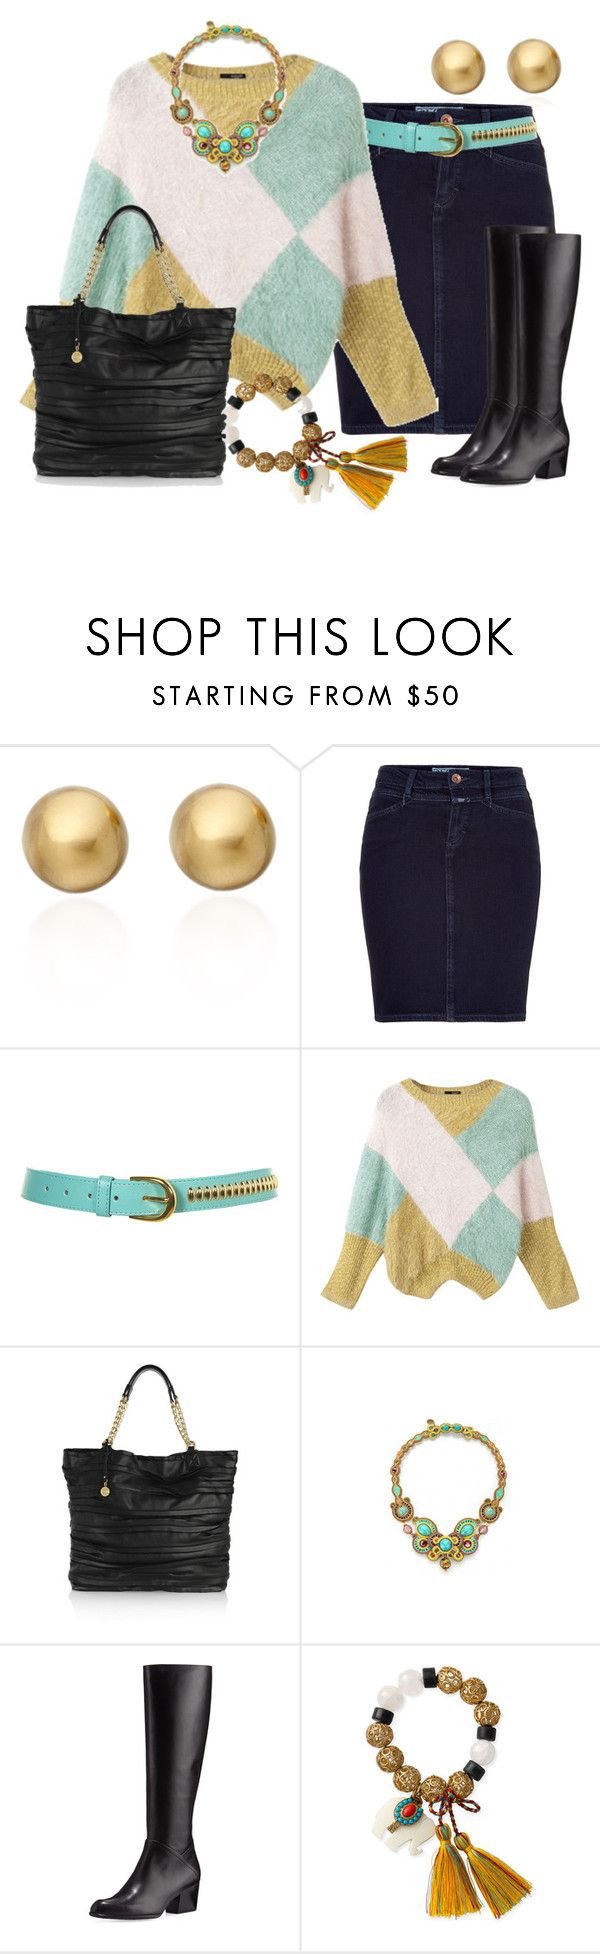 """FALDAS DE JEAN"" by outfits-de-moda2 ❤ liked on Polyvore featuring Astley Clarke, Closed, DKNY, Dori Csengeri, Stuart Weitzman and Juicy Couture"